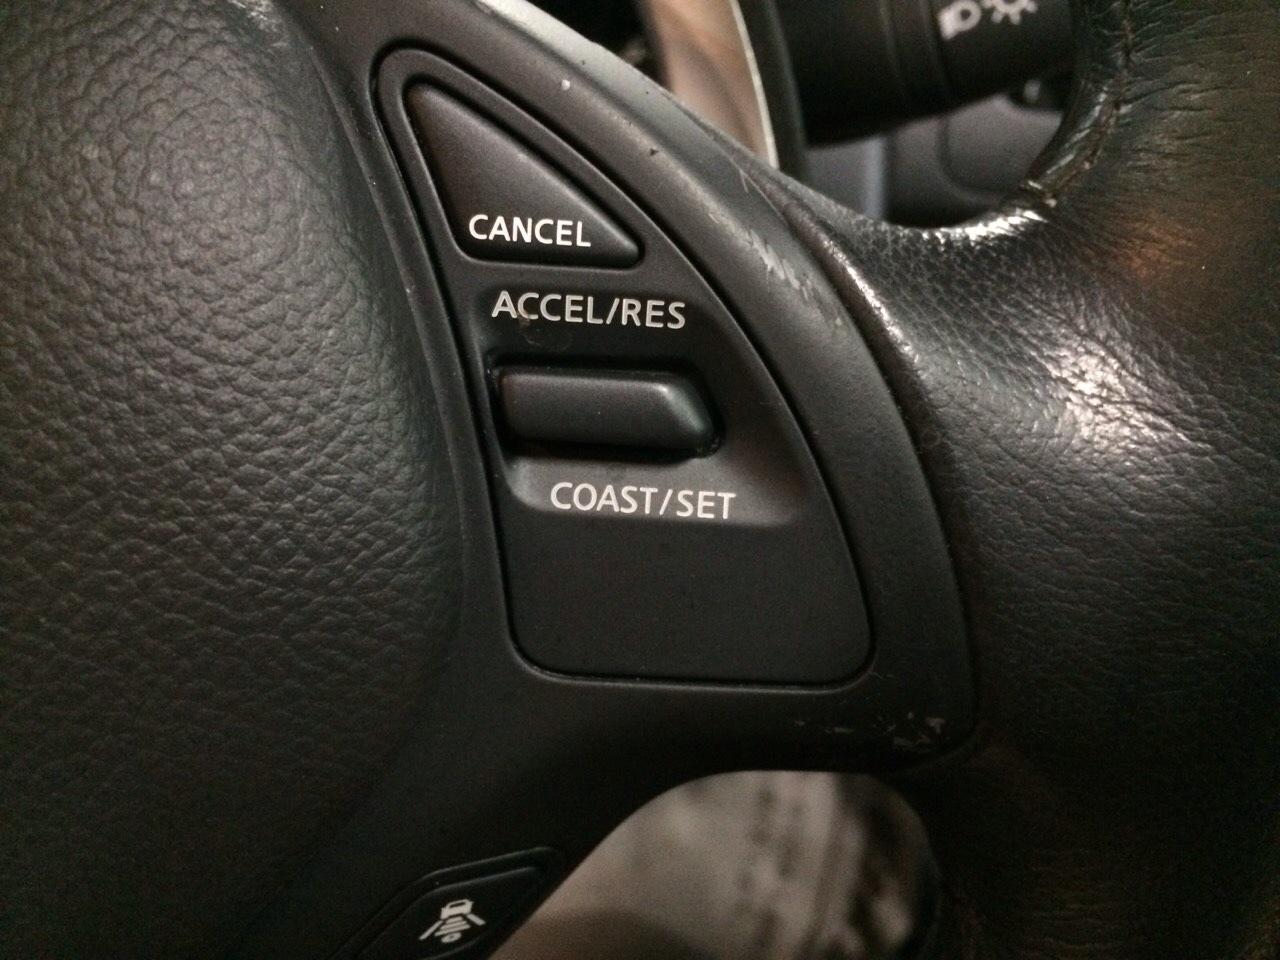 2007 Nissan Skyline V36 sedan 350GT Type SP radar cruise control buttons